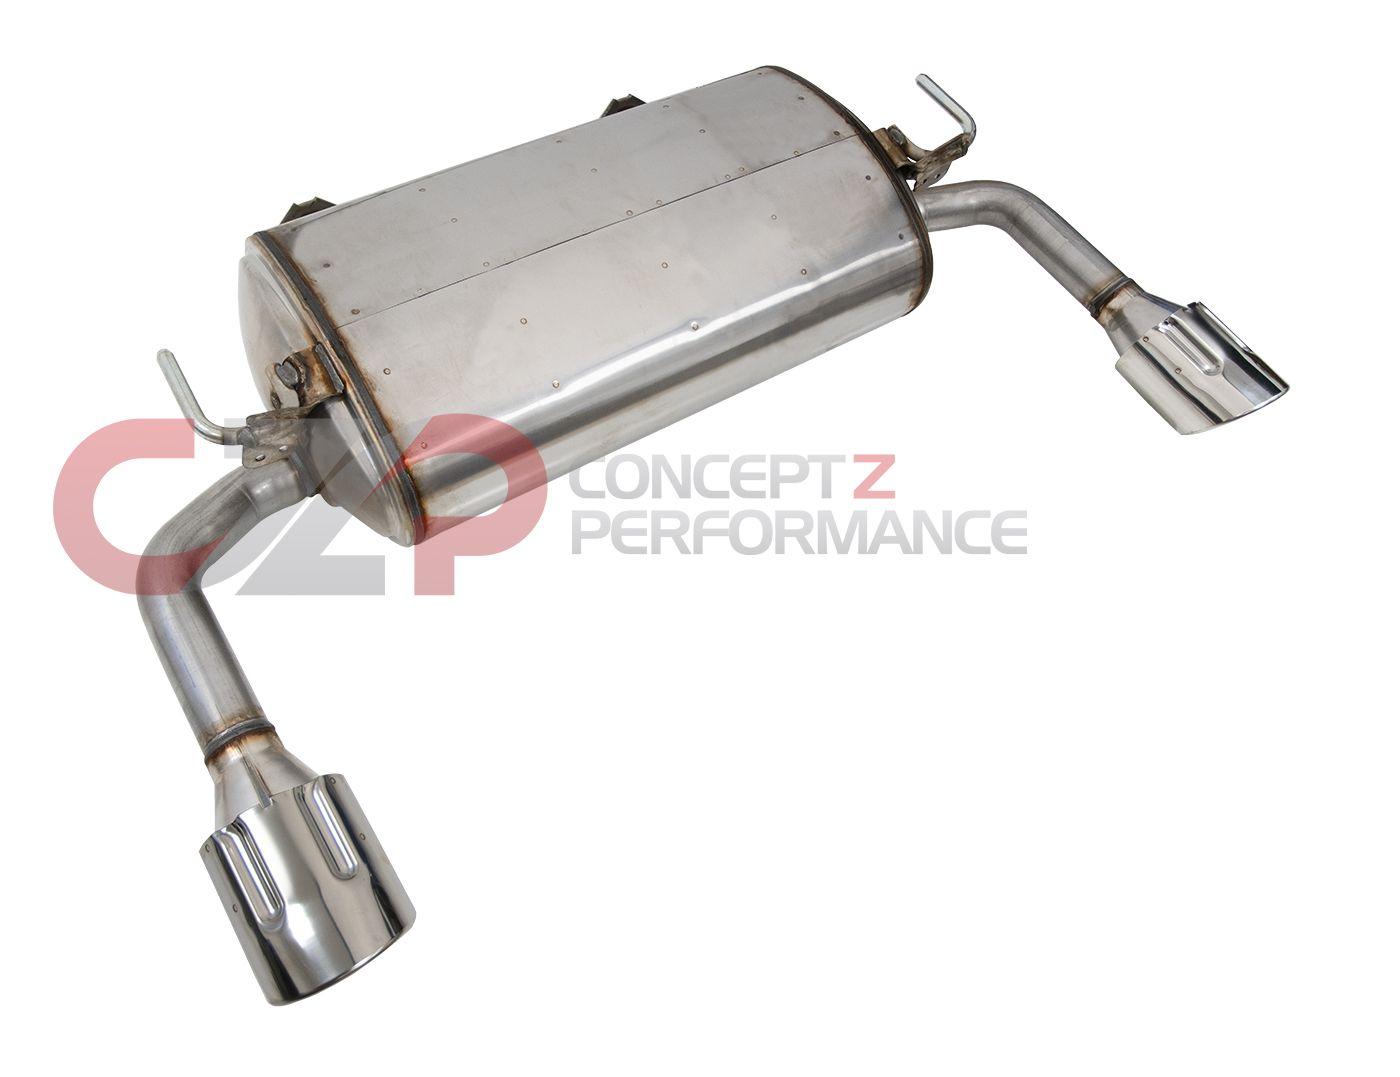 nissan infiniti infiniti oem exhaust muffler assembly infiniti q50 v37 3 5l 3 7l 20100 4ga0d concept z performance